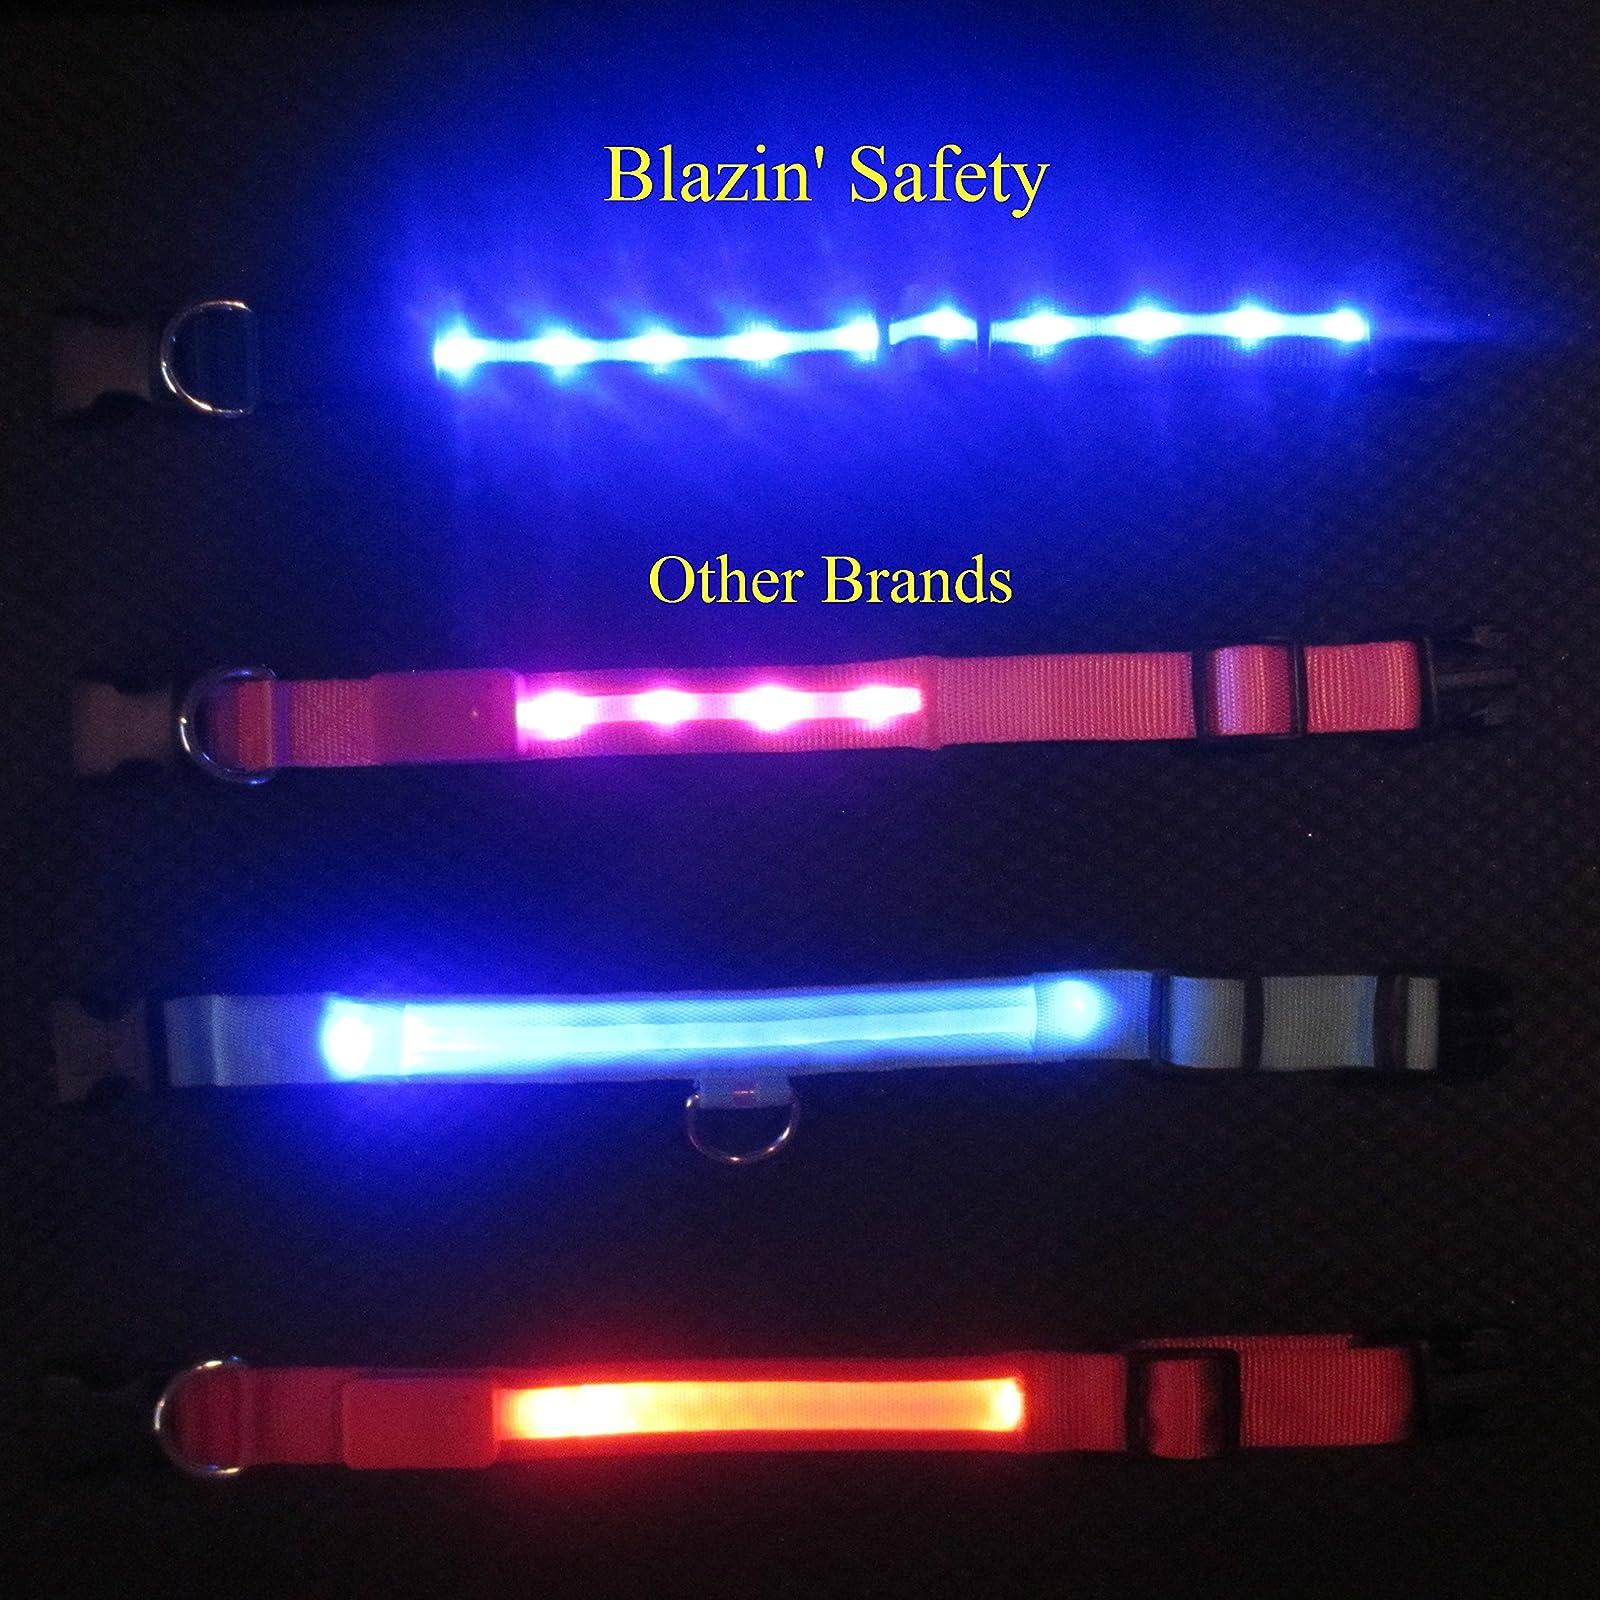 Blazin' Safety LED Dog Leash - USB Rechargeable - 2